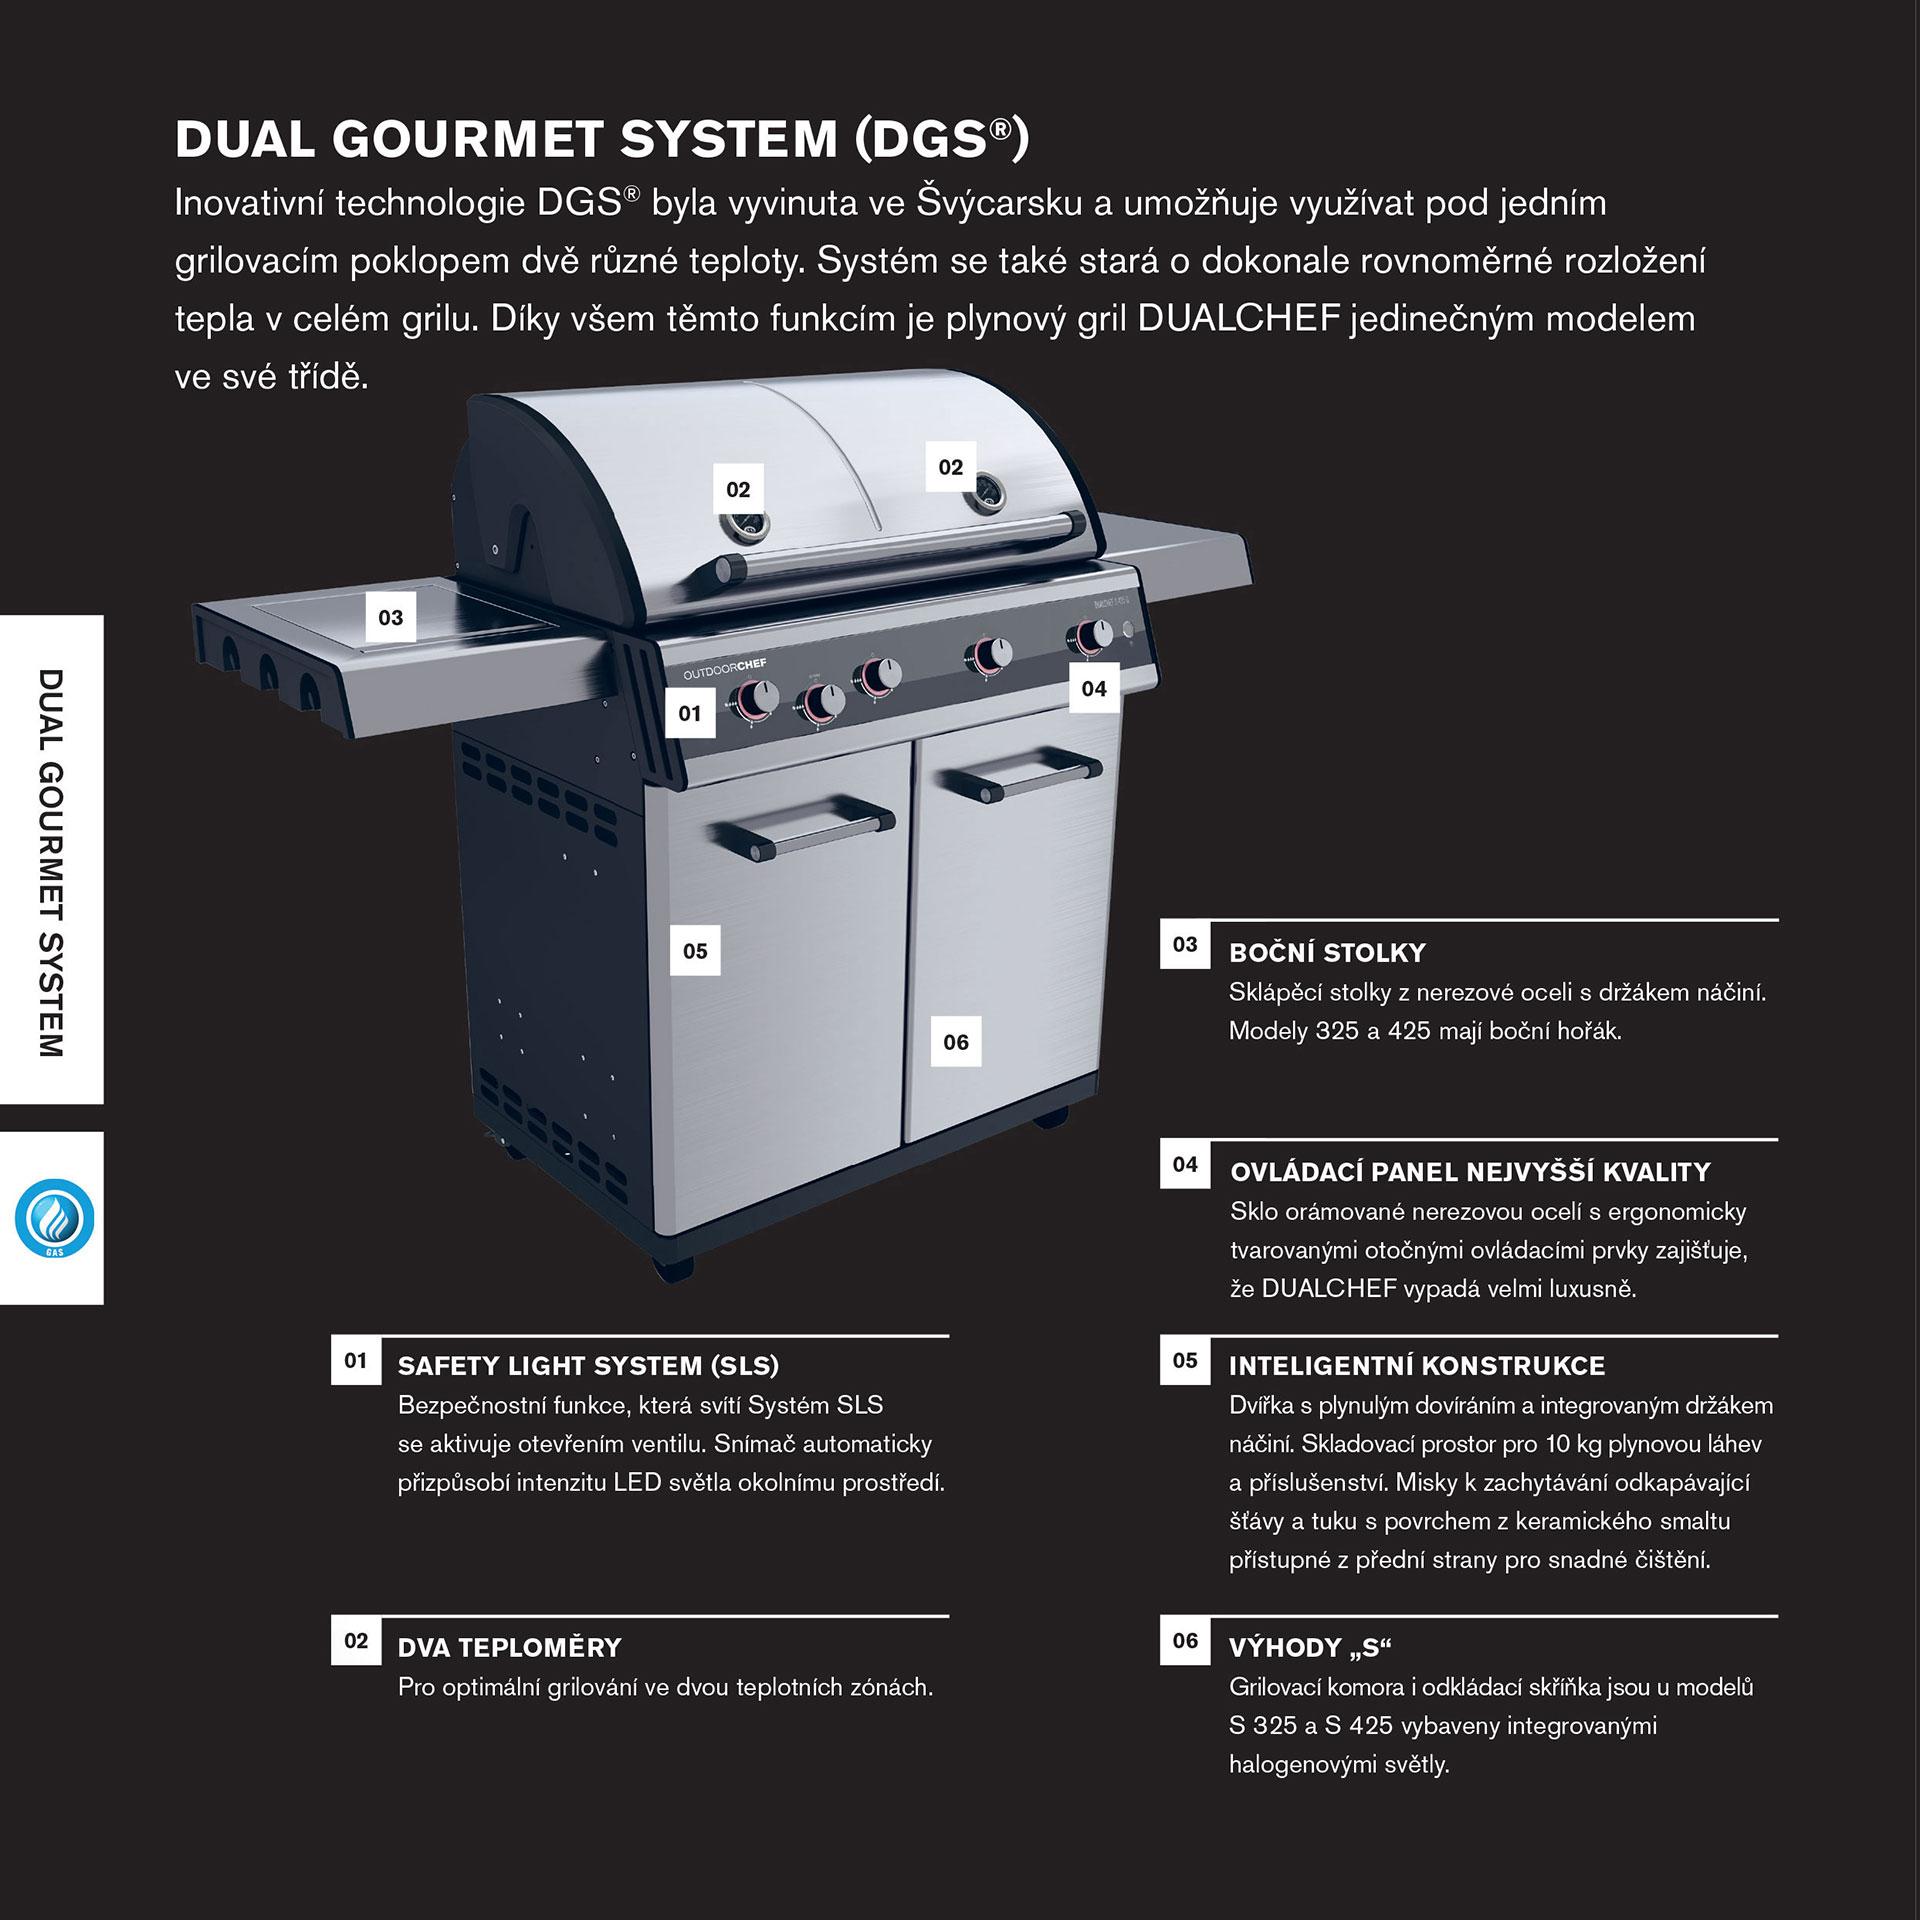 DUAL GOURMET SYSTEM